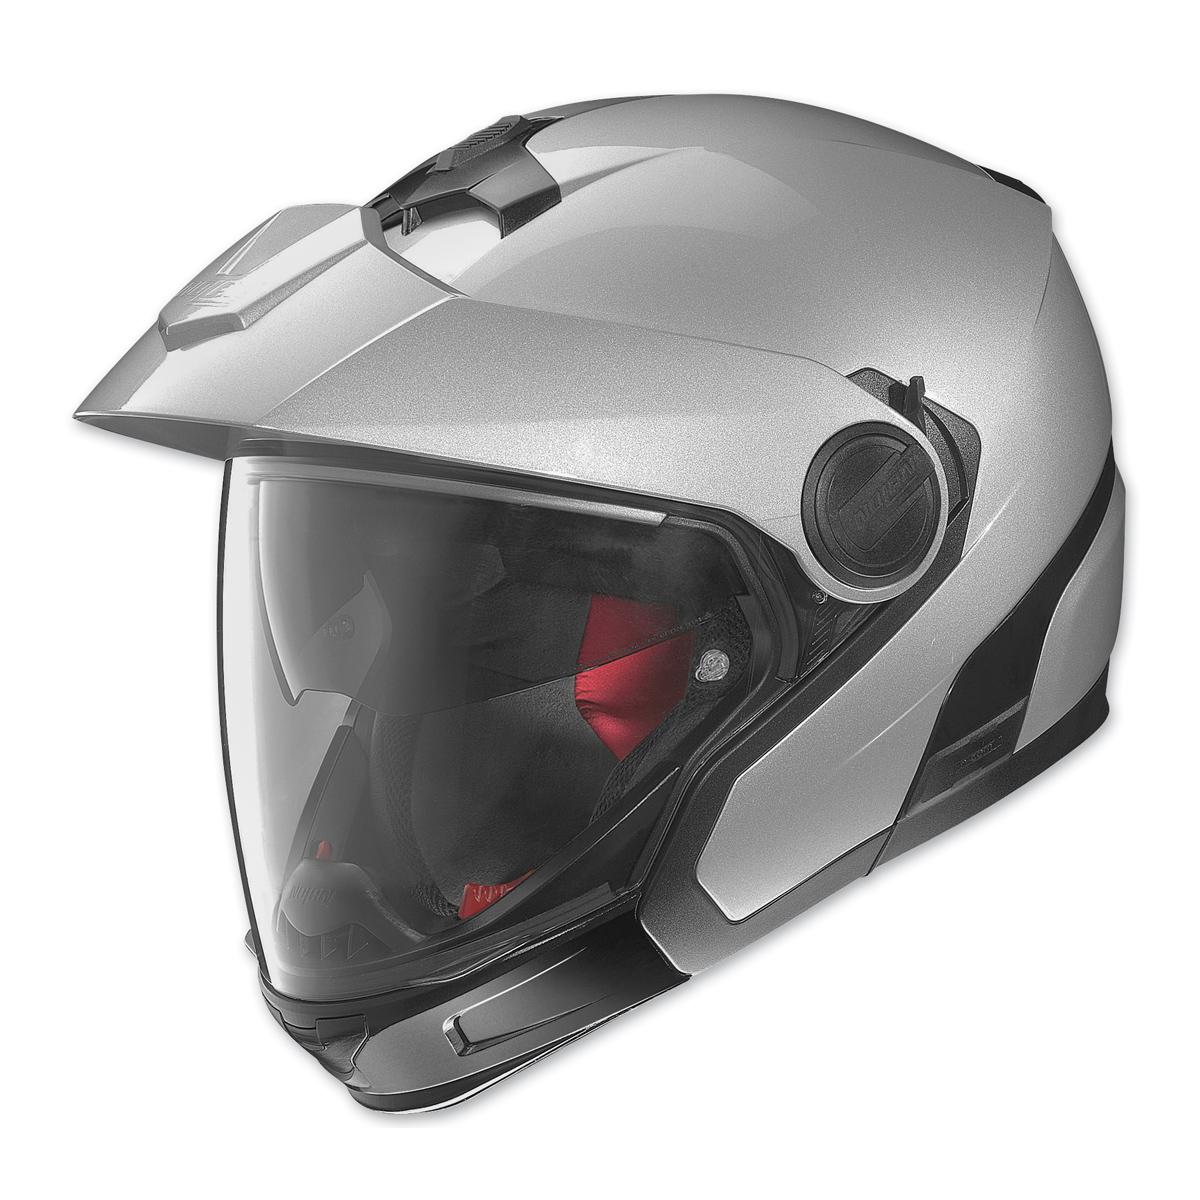 Motors Apparel & Merchandise Nolan Trilogy Faceshield for N43 Helmet Size Clear Motorcycle Visors